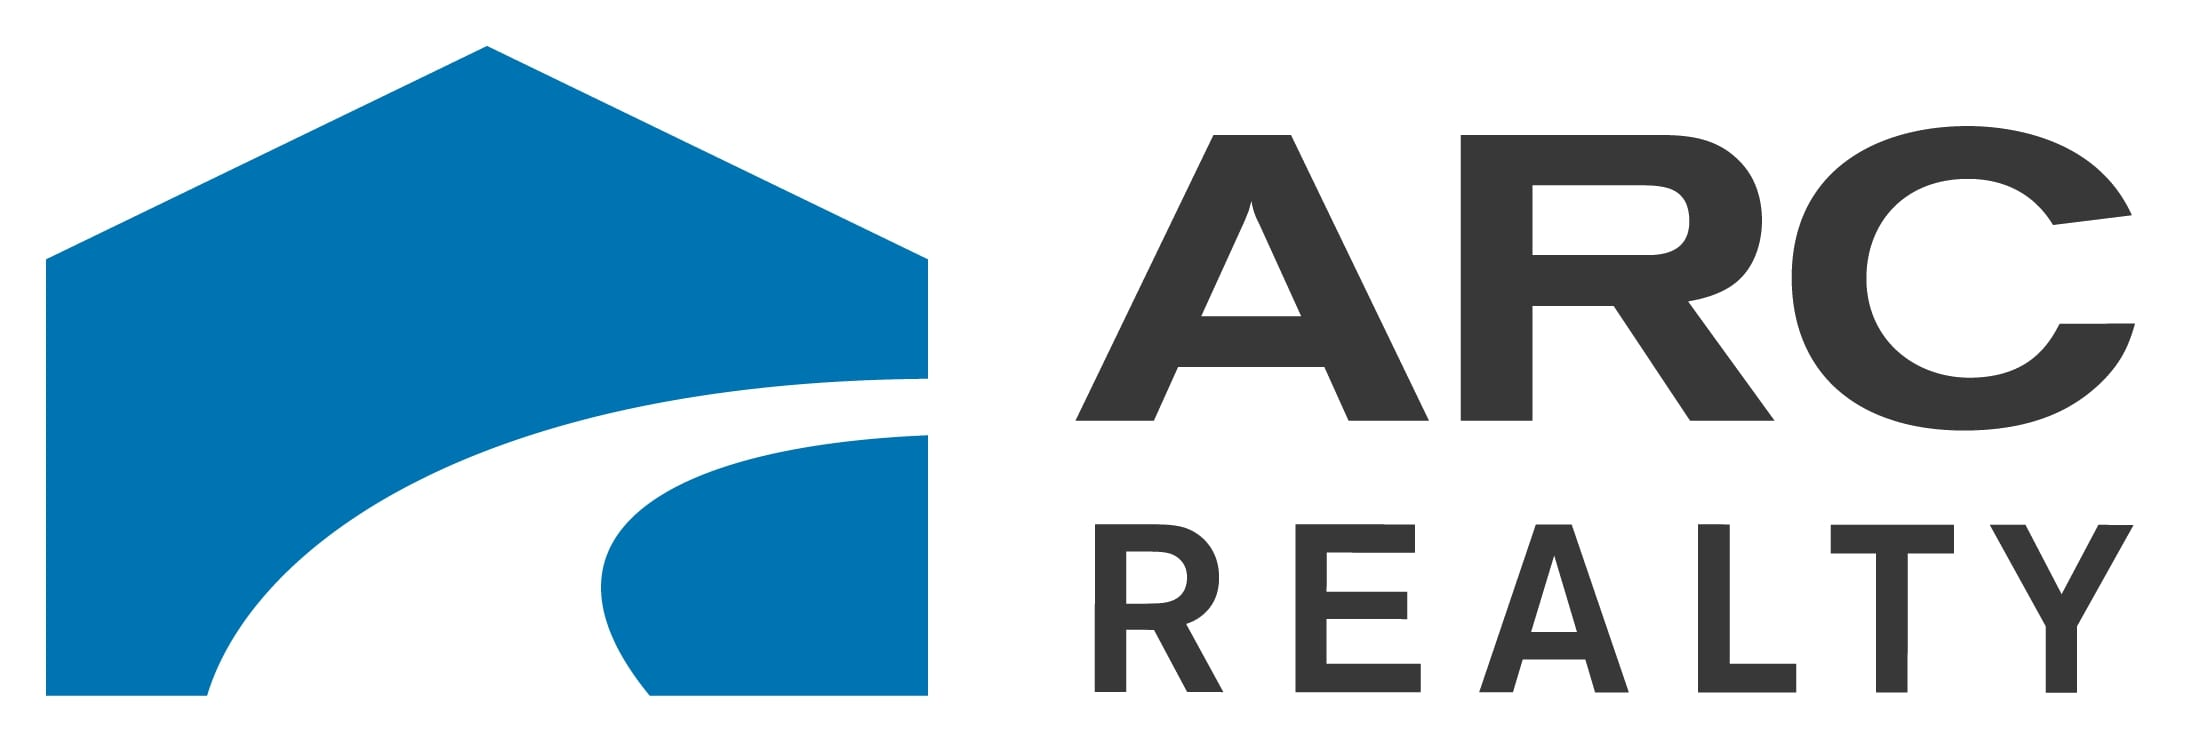 ARC Logo color transp crop - Copy.jpg